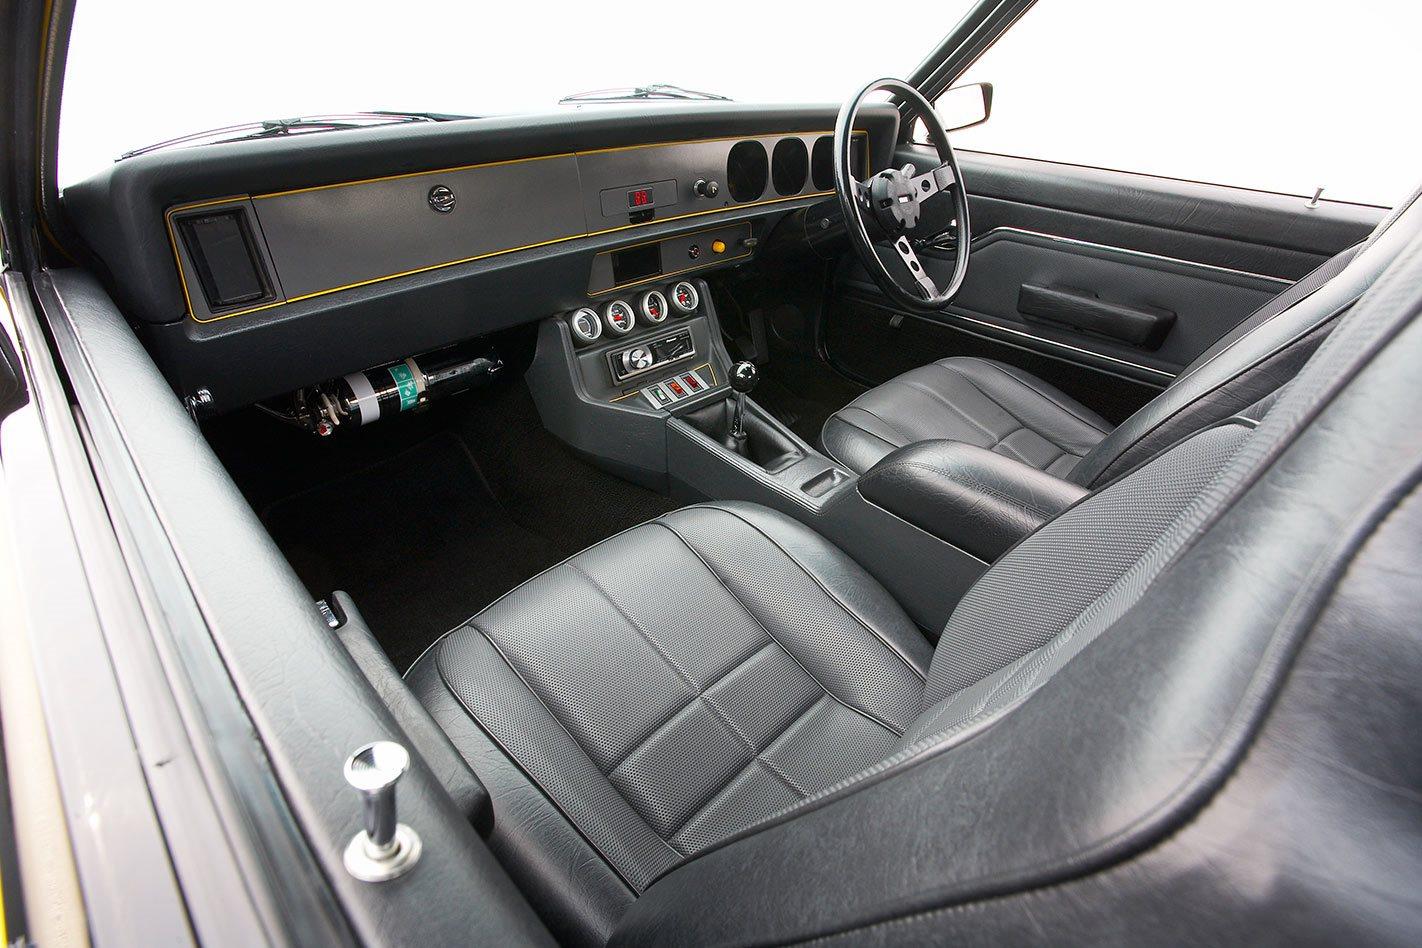 Car Interior Heaters Ivoiregion Nissan Np200 Fuse Box Chev 350 Powered Genuine Holden Torana Ss Hatch